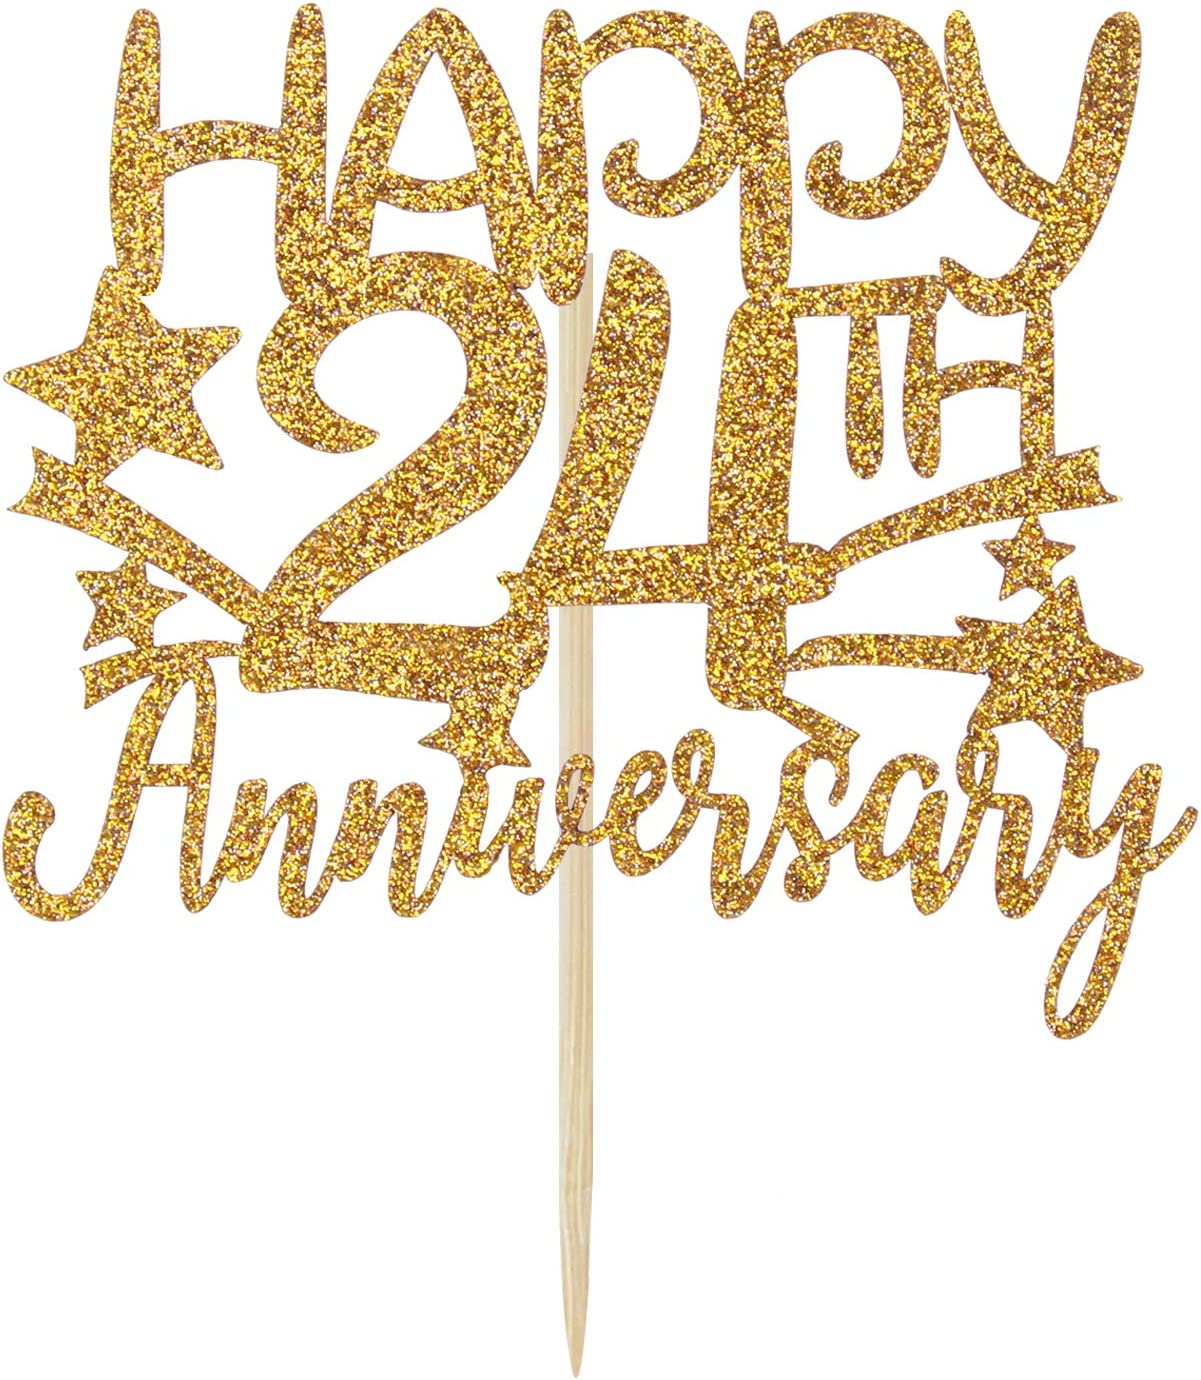 Gold Glitter Happy 24th Anniversary Cake Topper for Wedding ...